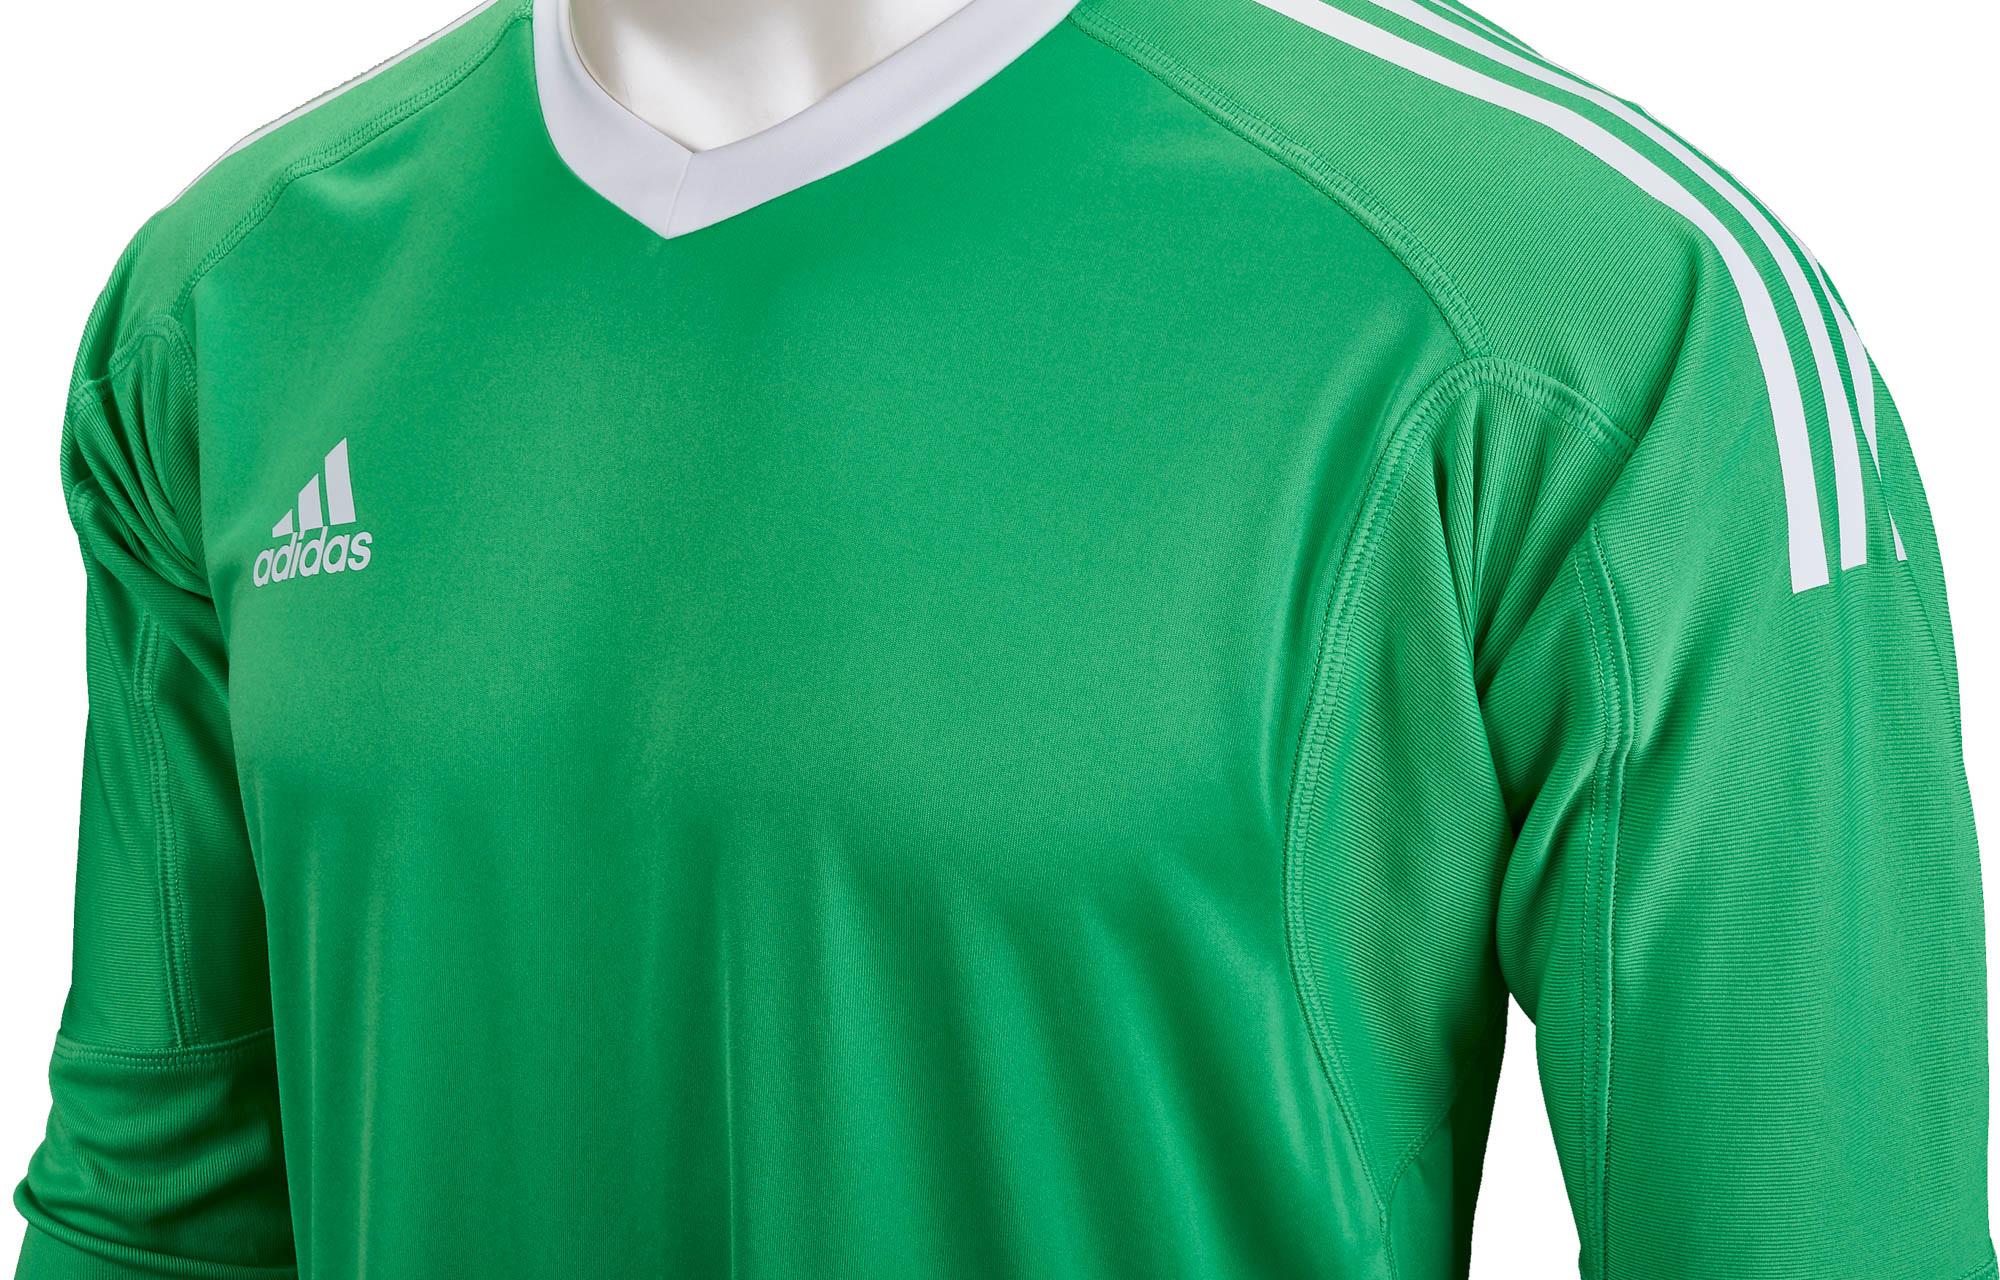 5f36fd492 adidas Revigo 17 Goalkeeper Jersey - Energy Green & White - Soccer ...